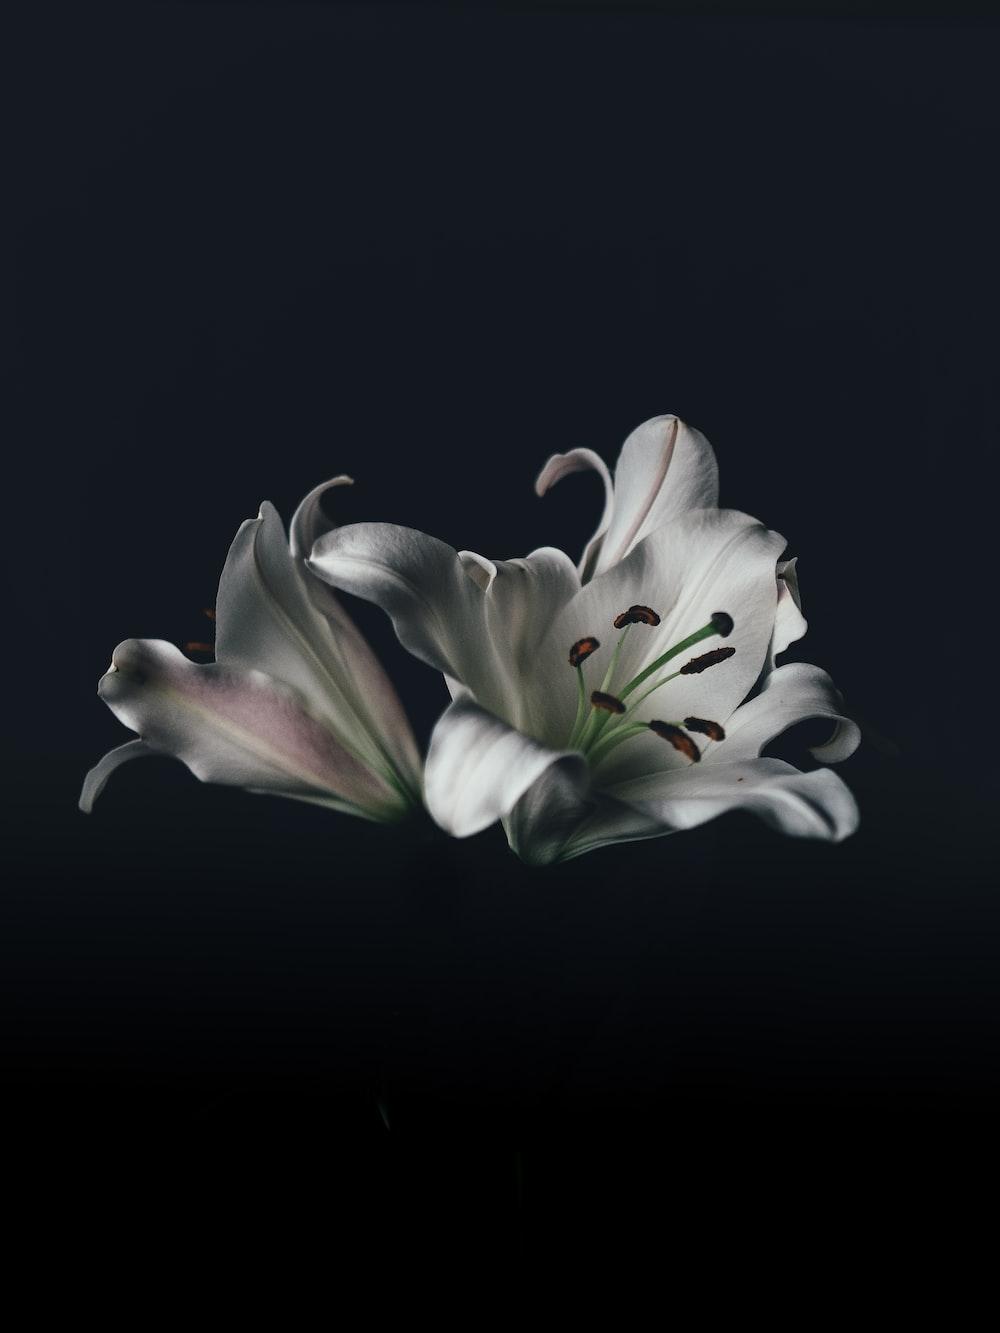 white oriental lily flower